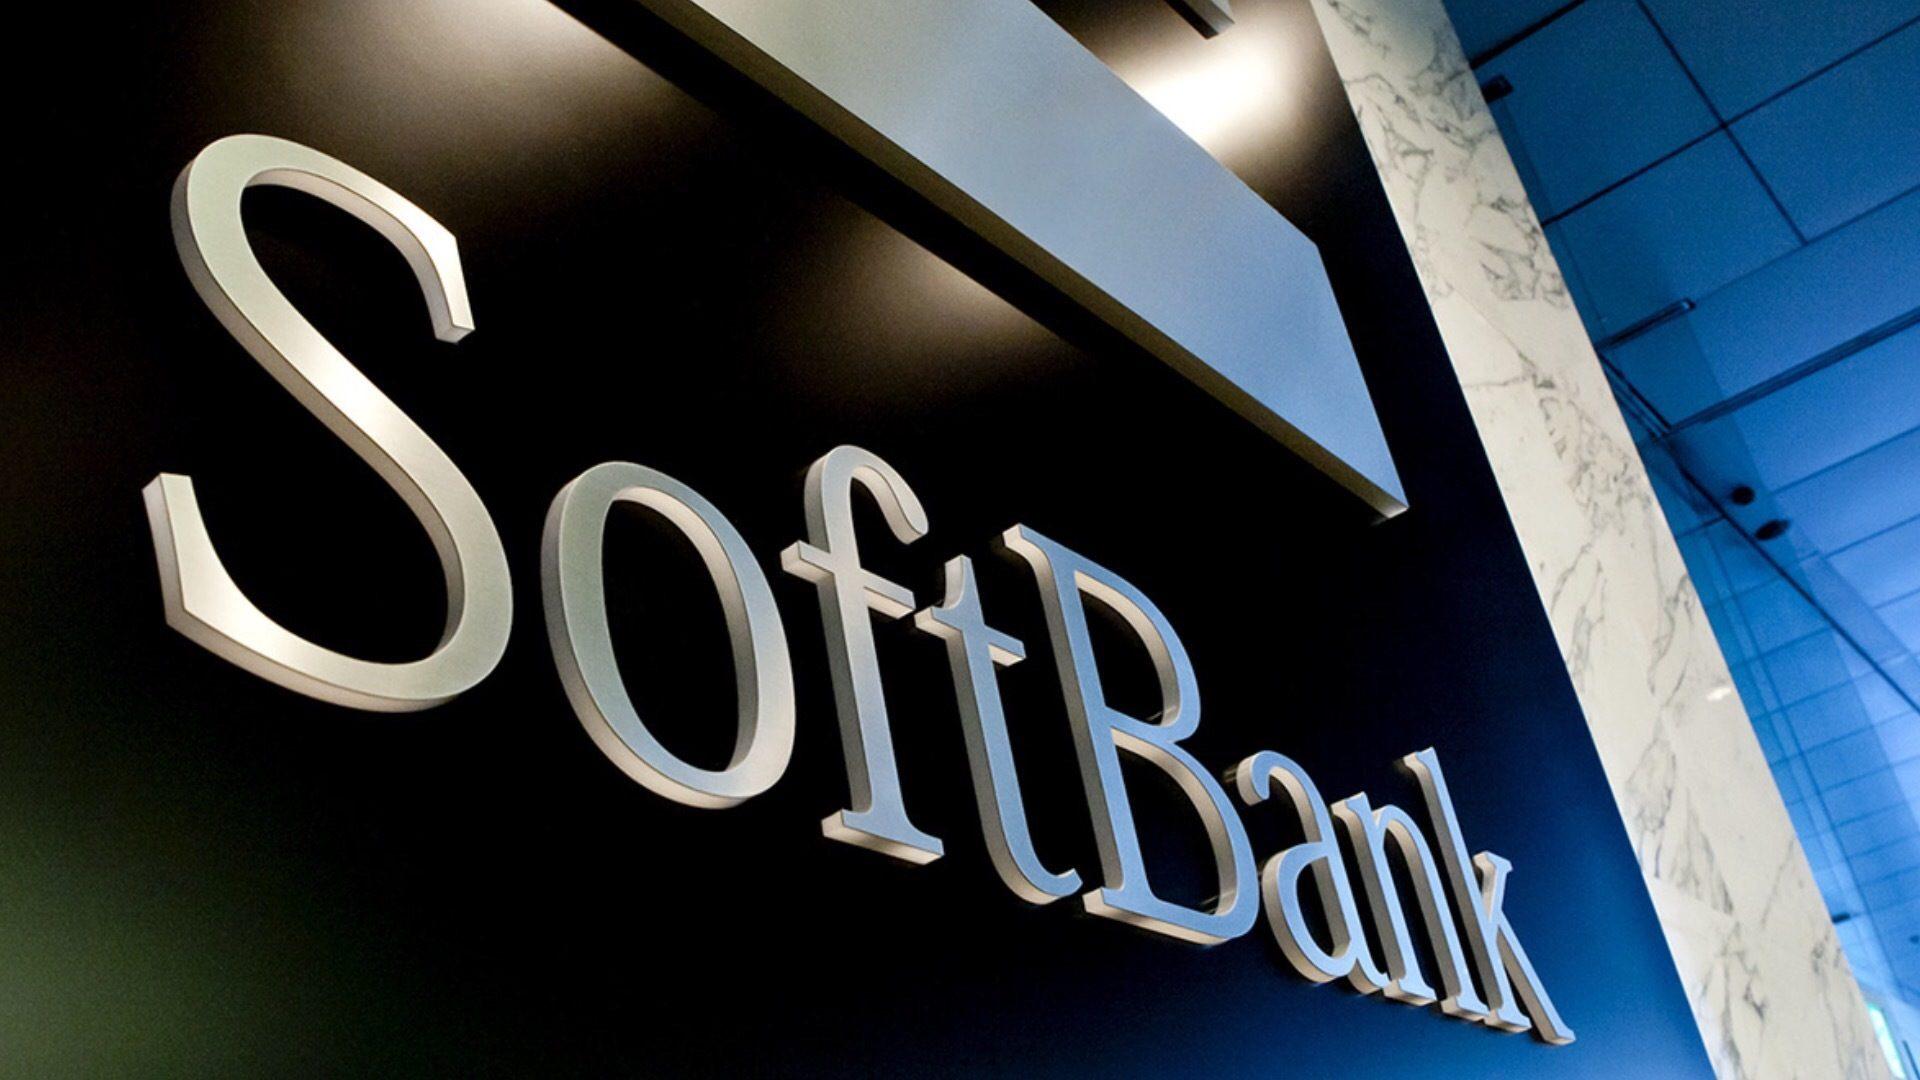 H SoftBank επενδύει 940 εκατ. δολάρια σε αμερικανική startup ρομποτικών οχημάτων